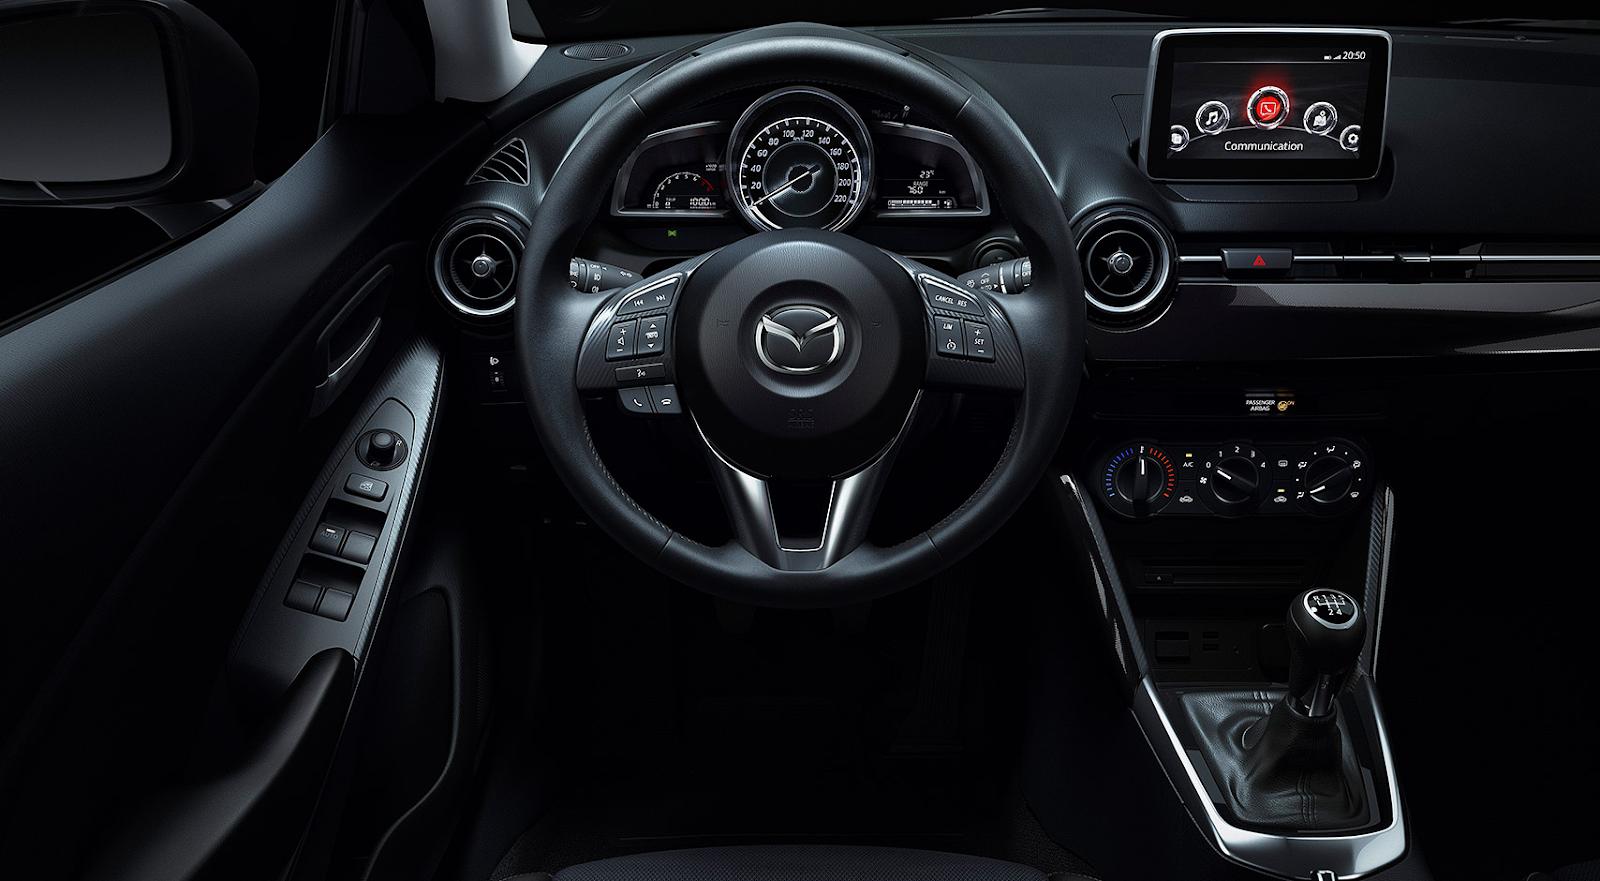 La tecnología Mazda 2 se refleja la seguridad